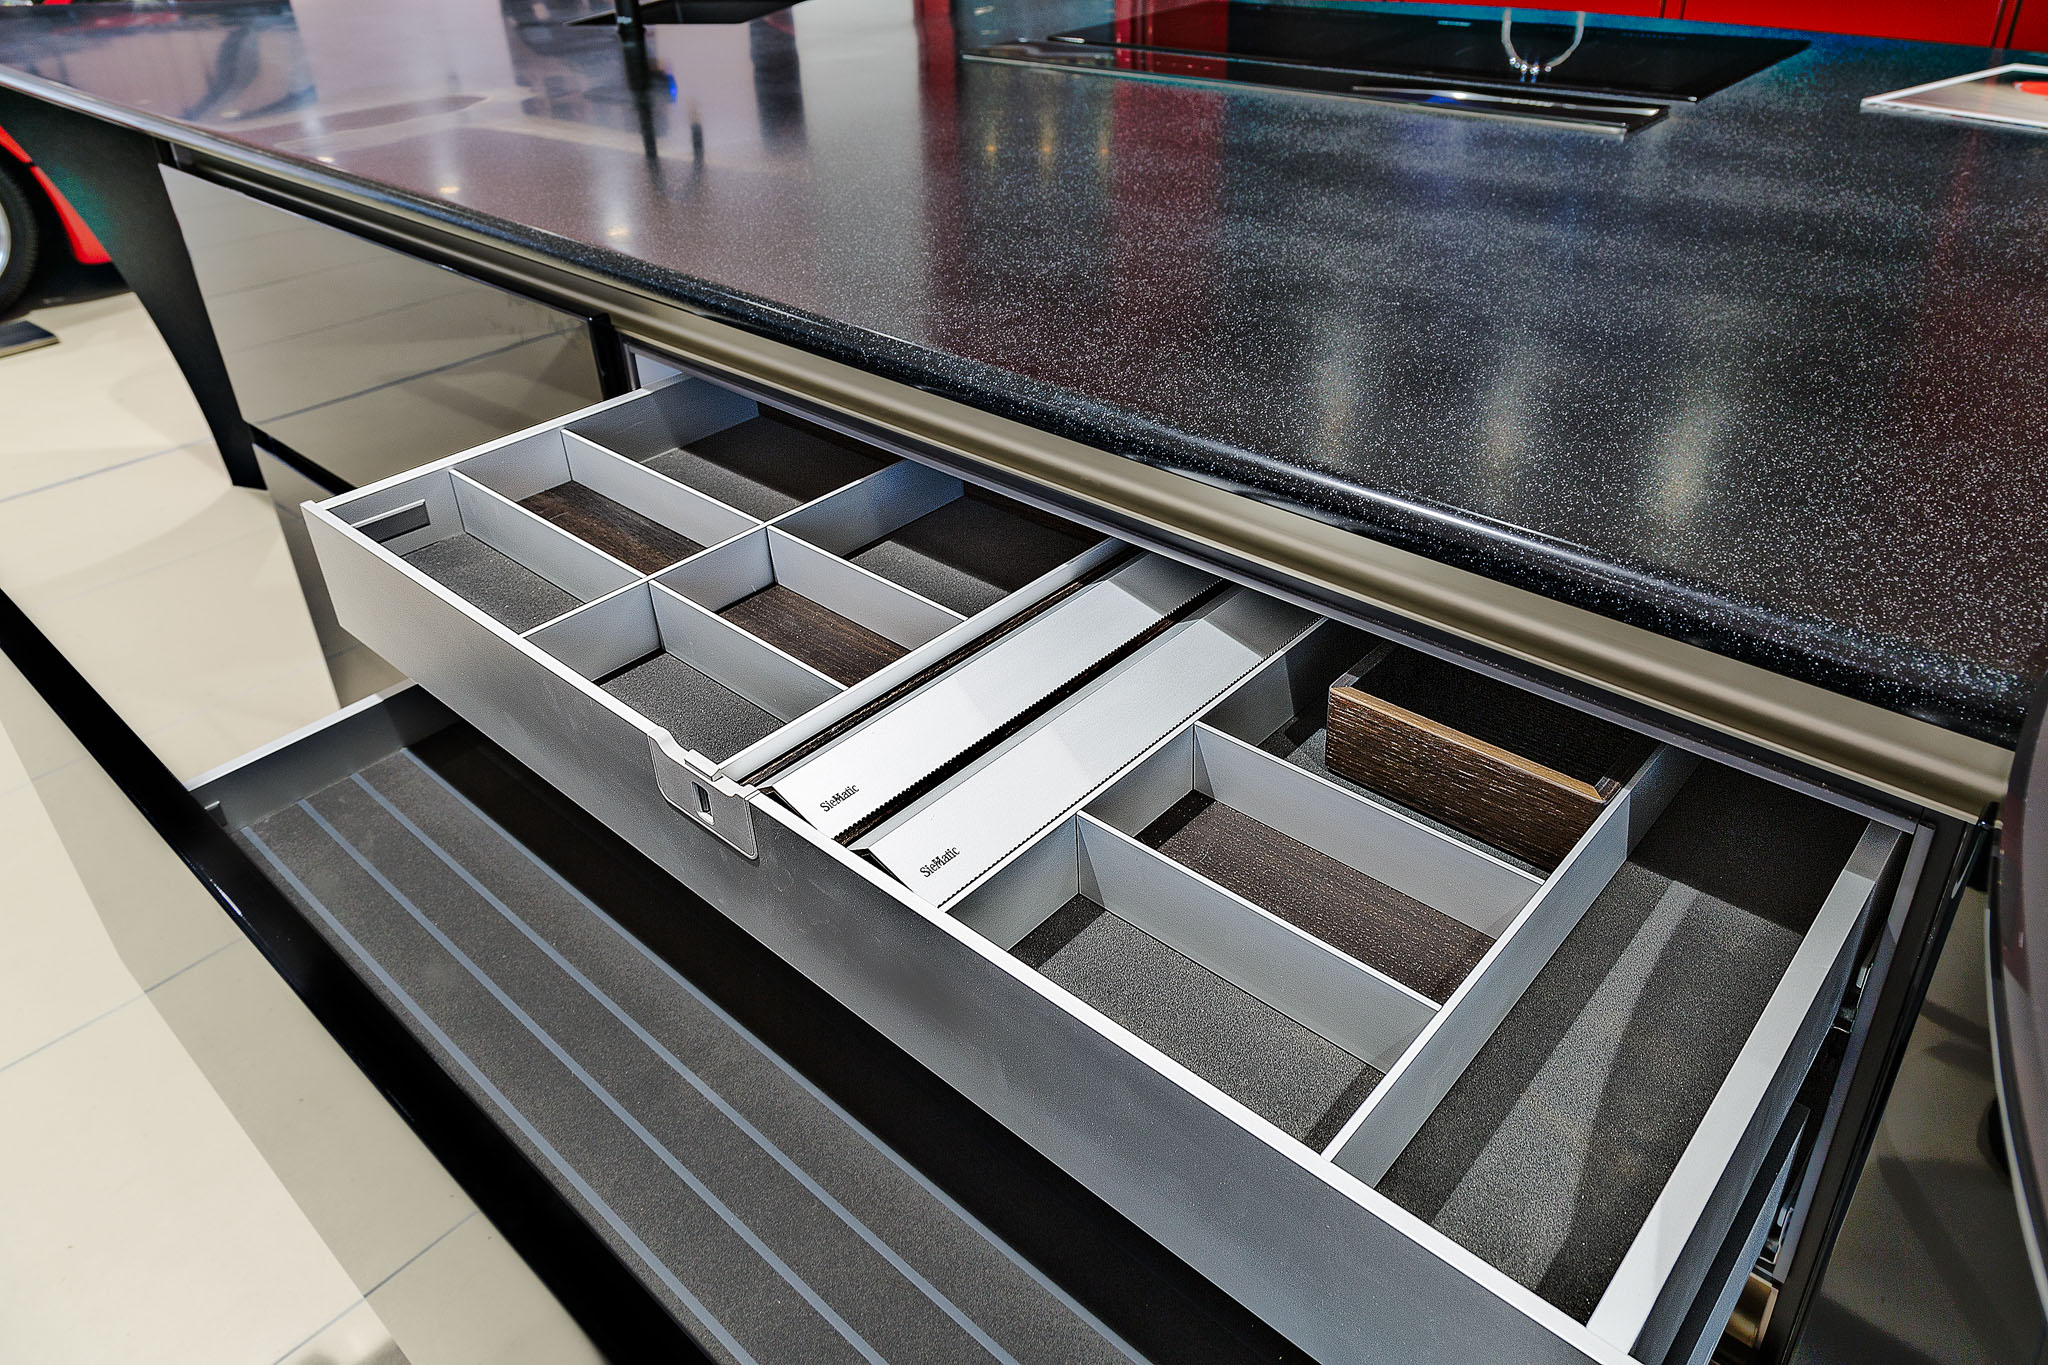 SieMatic cutlery drawer detail